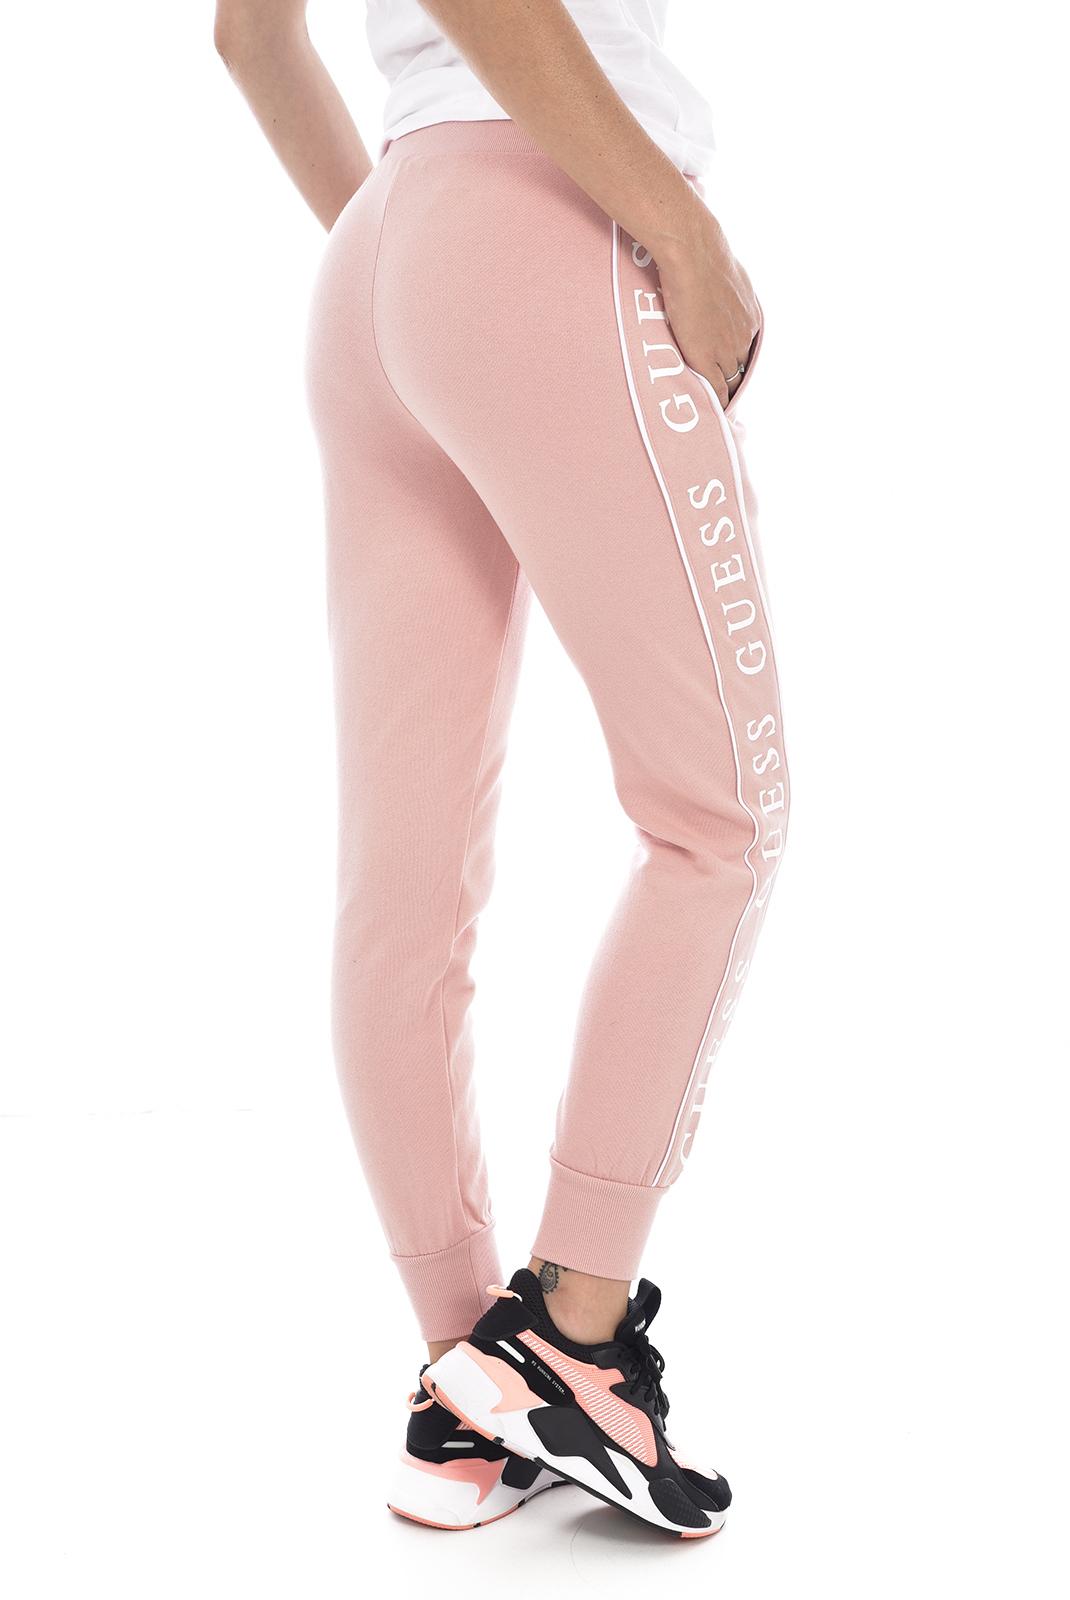 Pantalons  Guess jeans O94A59 FL01I g6p6 ROSE